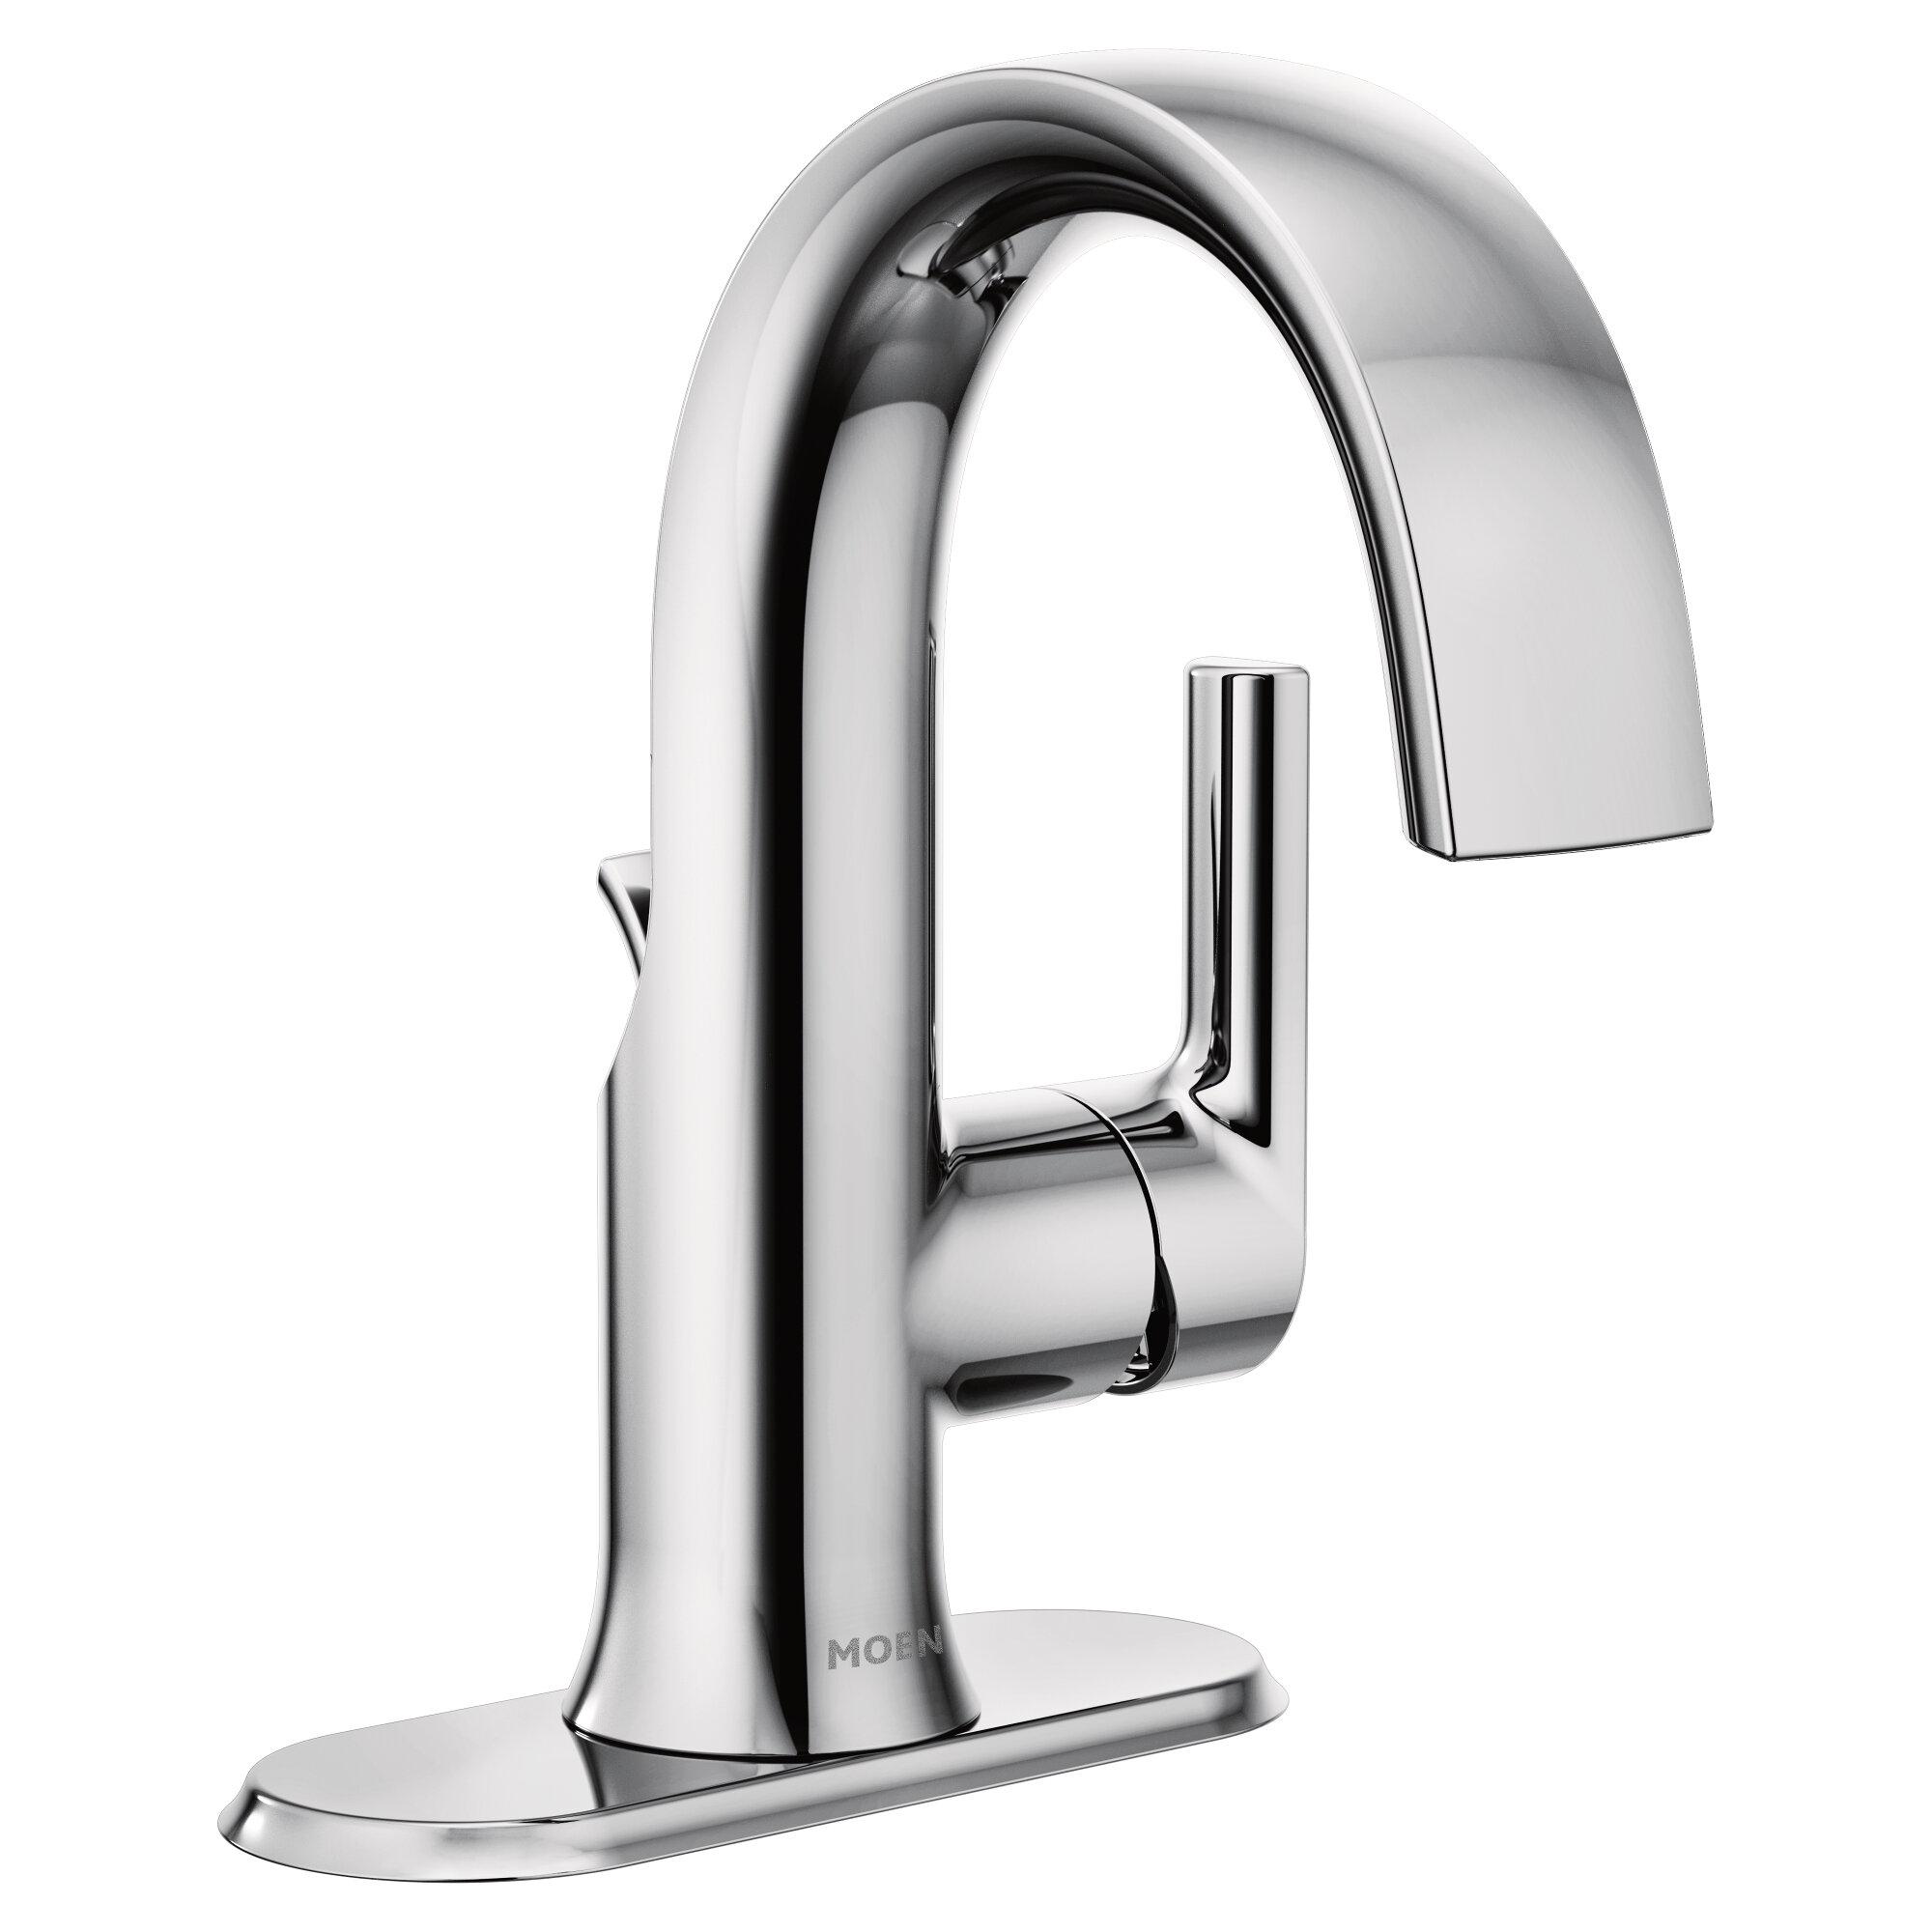 Moen Doux Single Hole Bathroom Faucet With Drain Assembly Reviews Wayfair